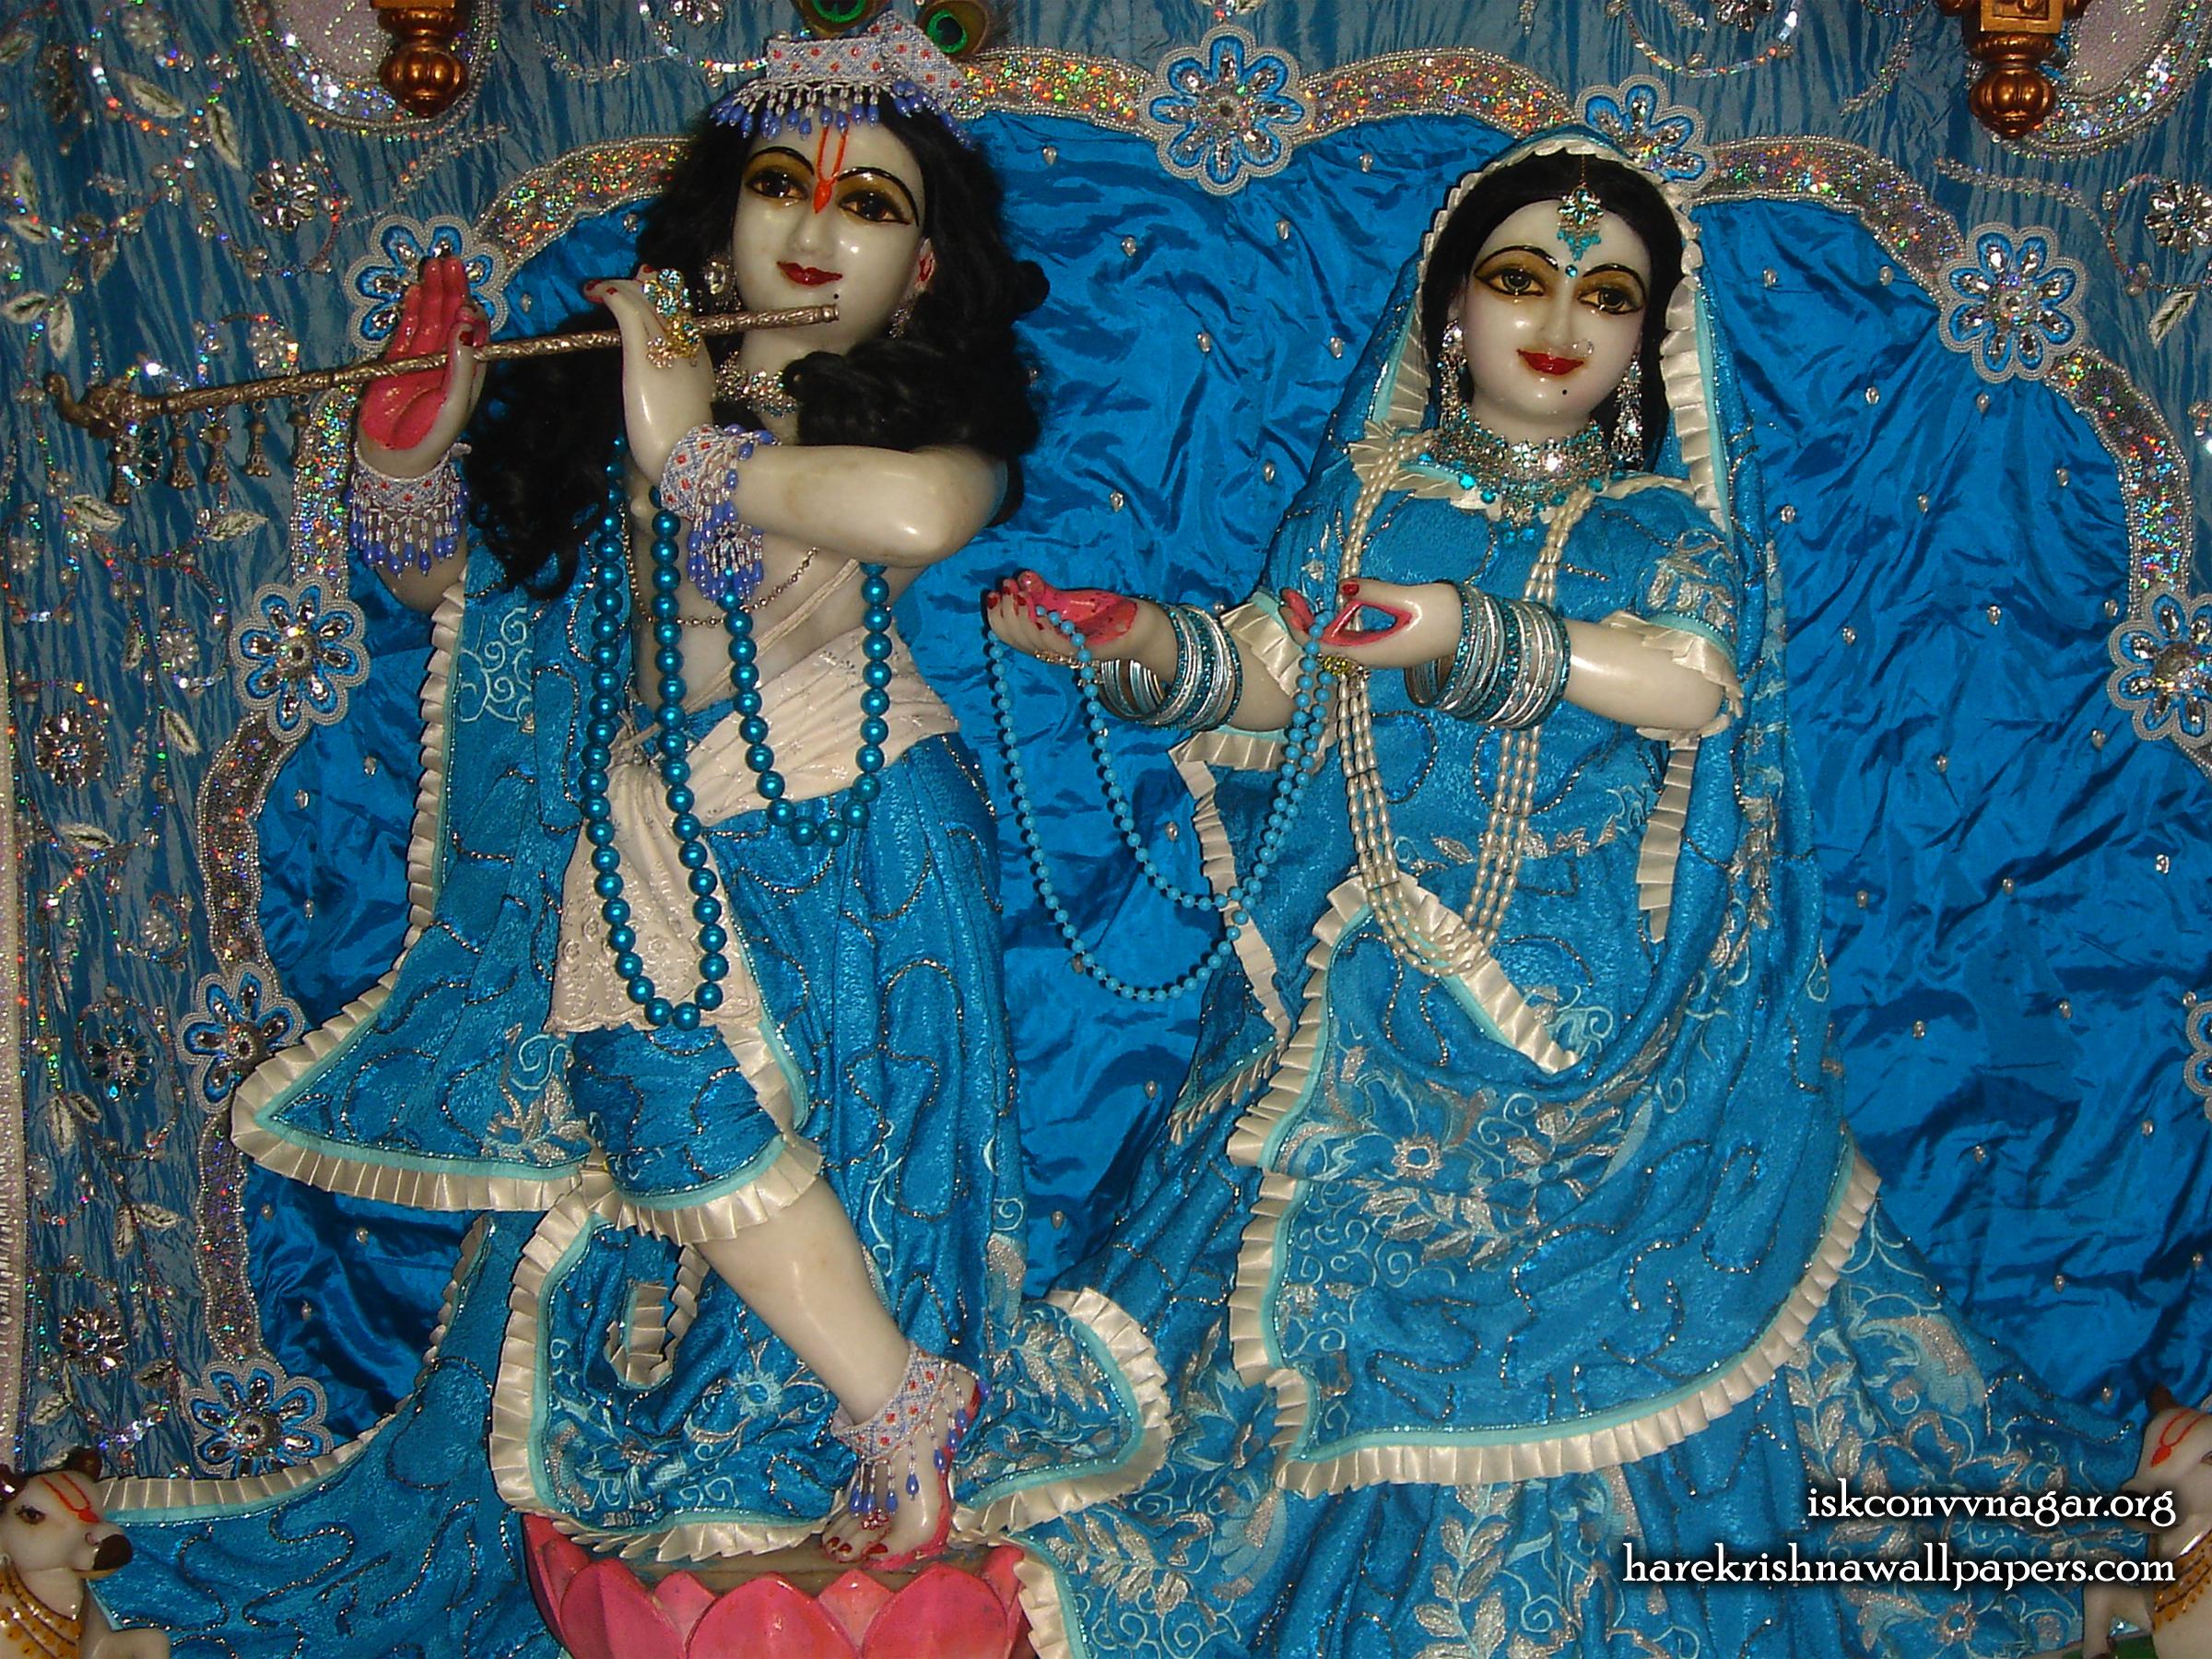 Sri Sri Radha Giridhari Wallpaper (029) Size 2400x1800 Download